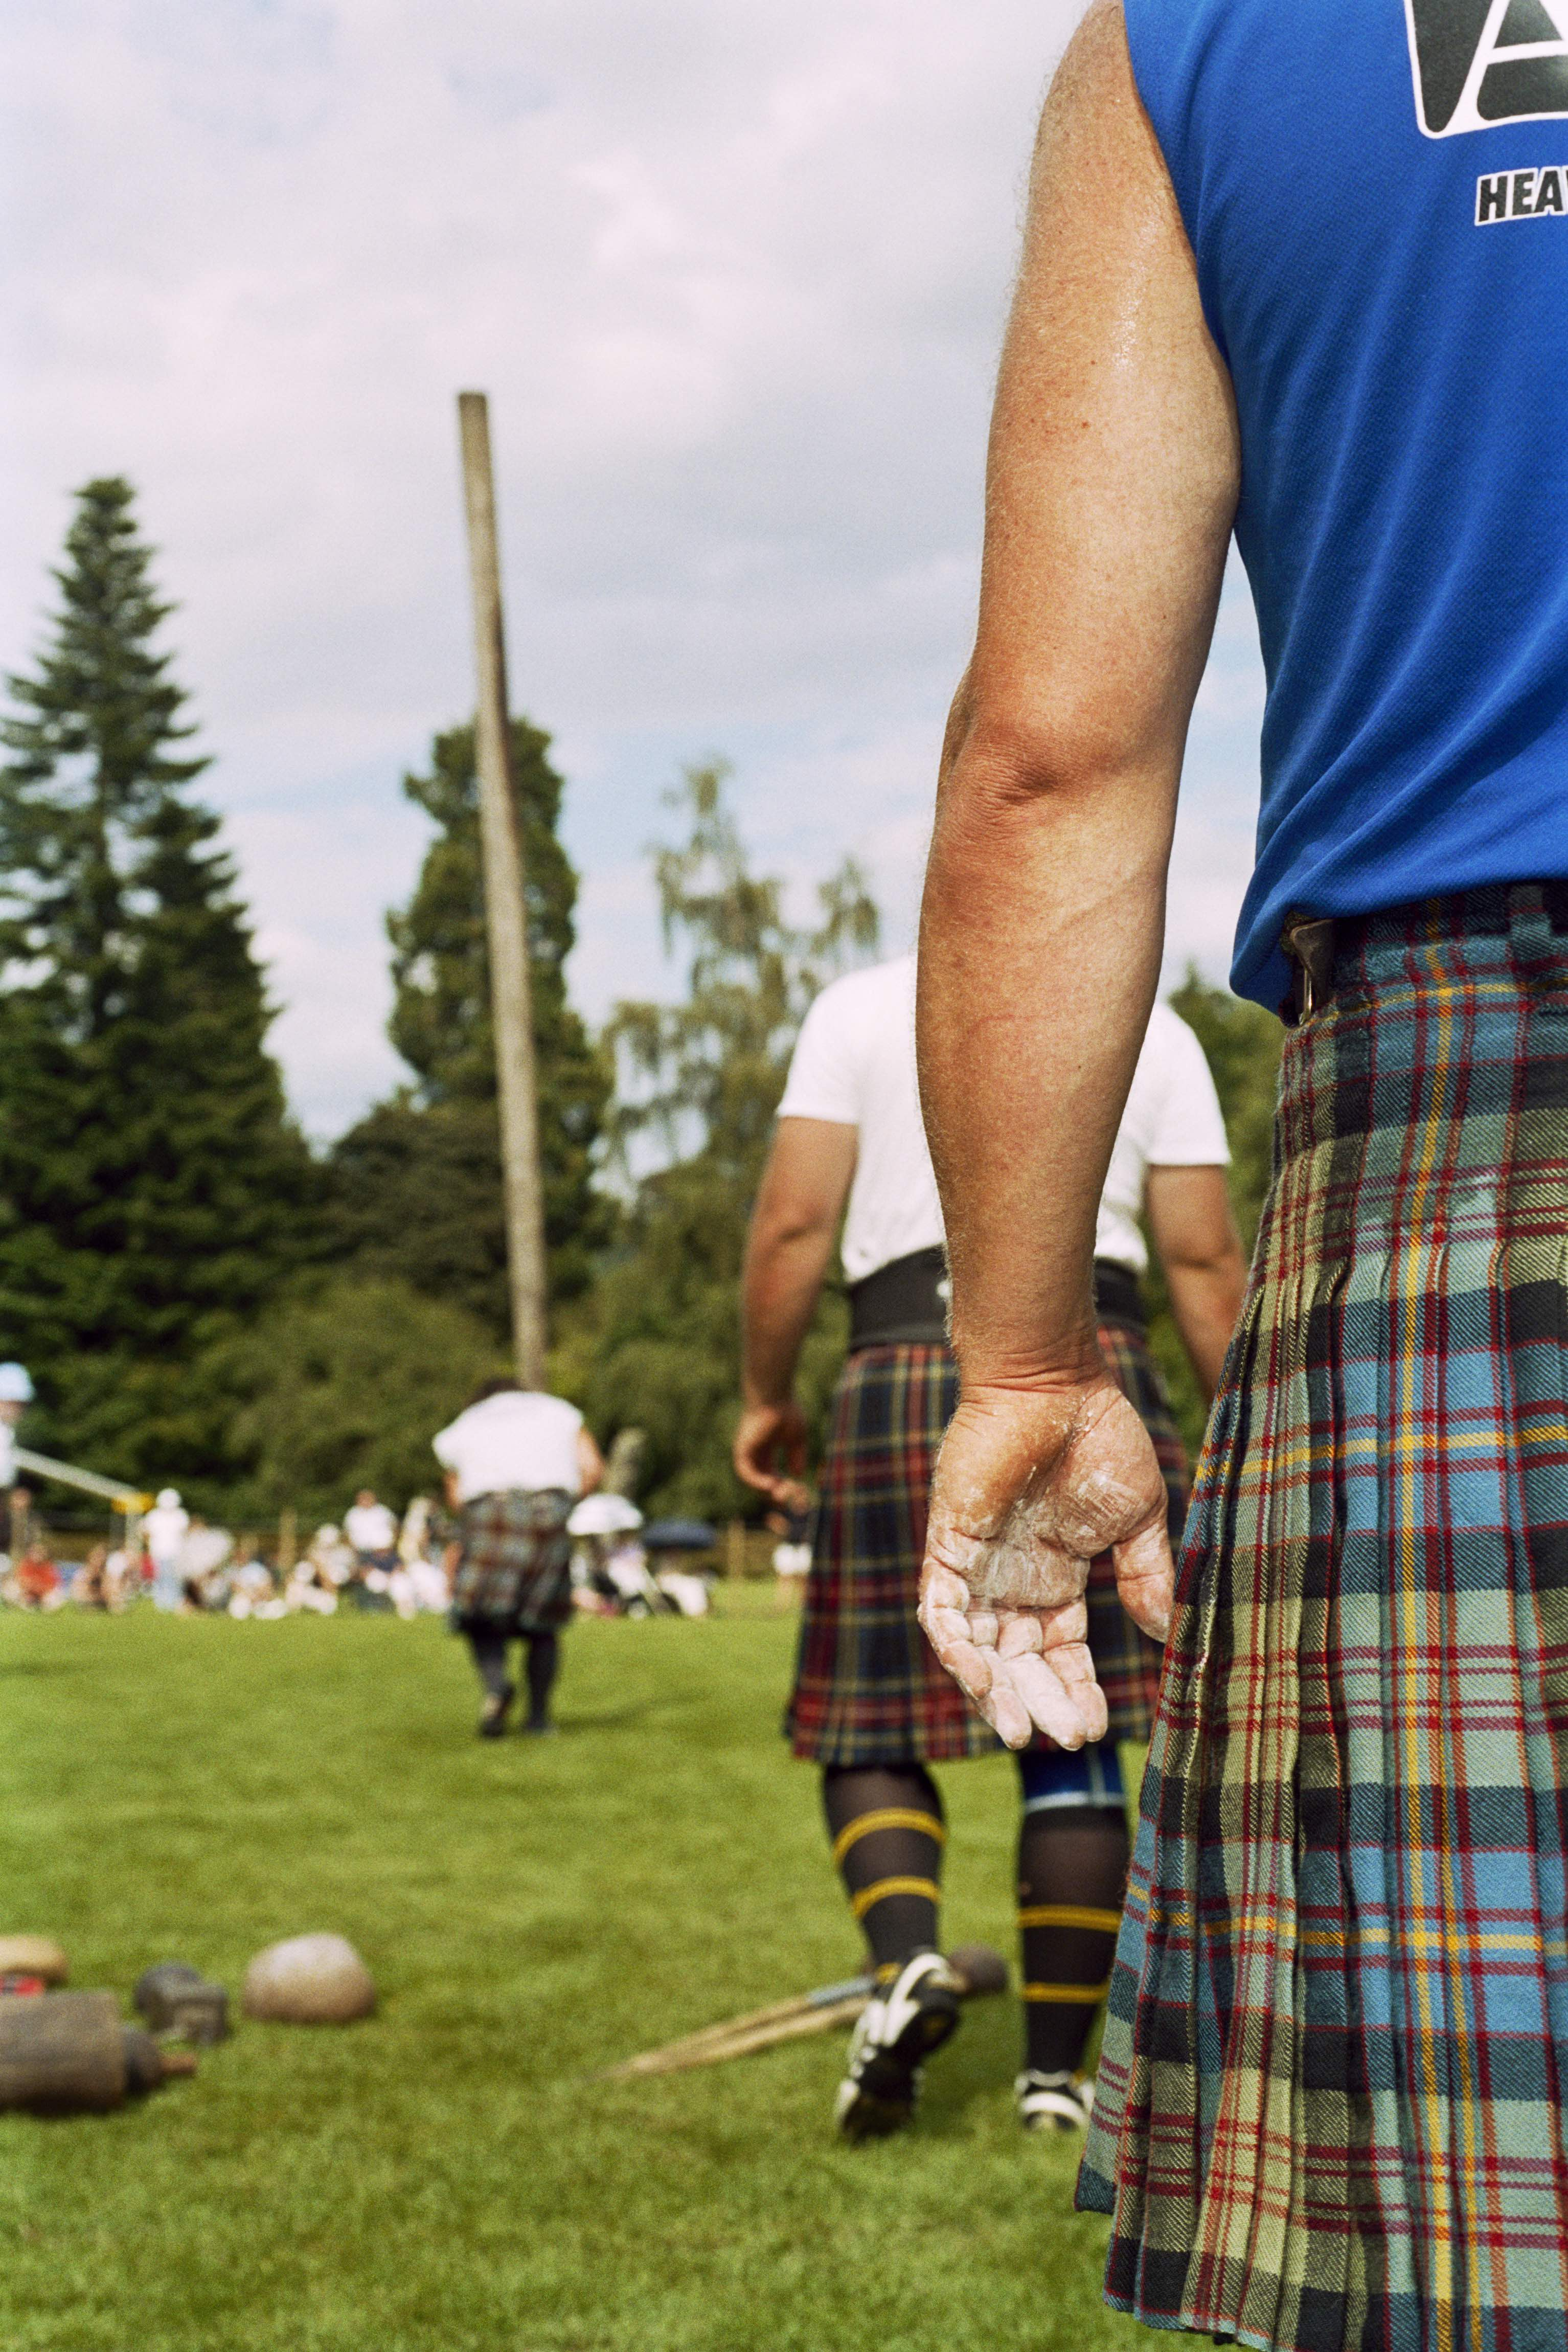 GB. Scotland. Inveraray. Highland Games. 2006. © Martin Parr/Magnum Photos